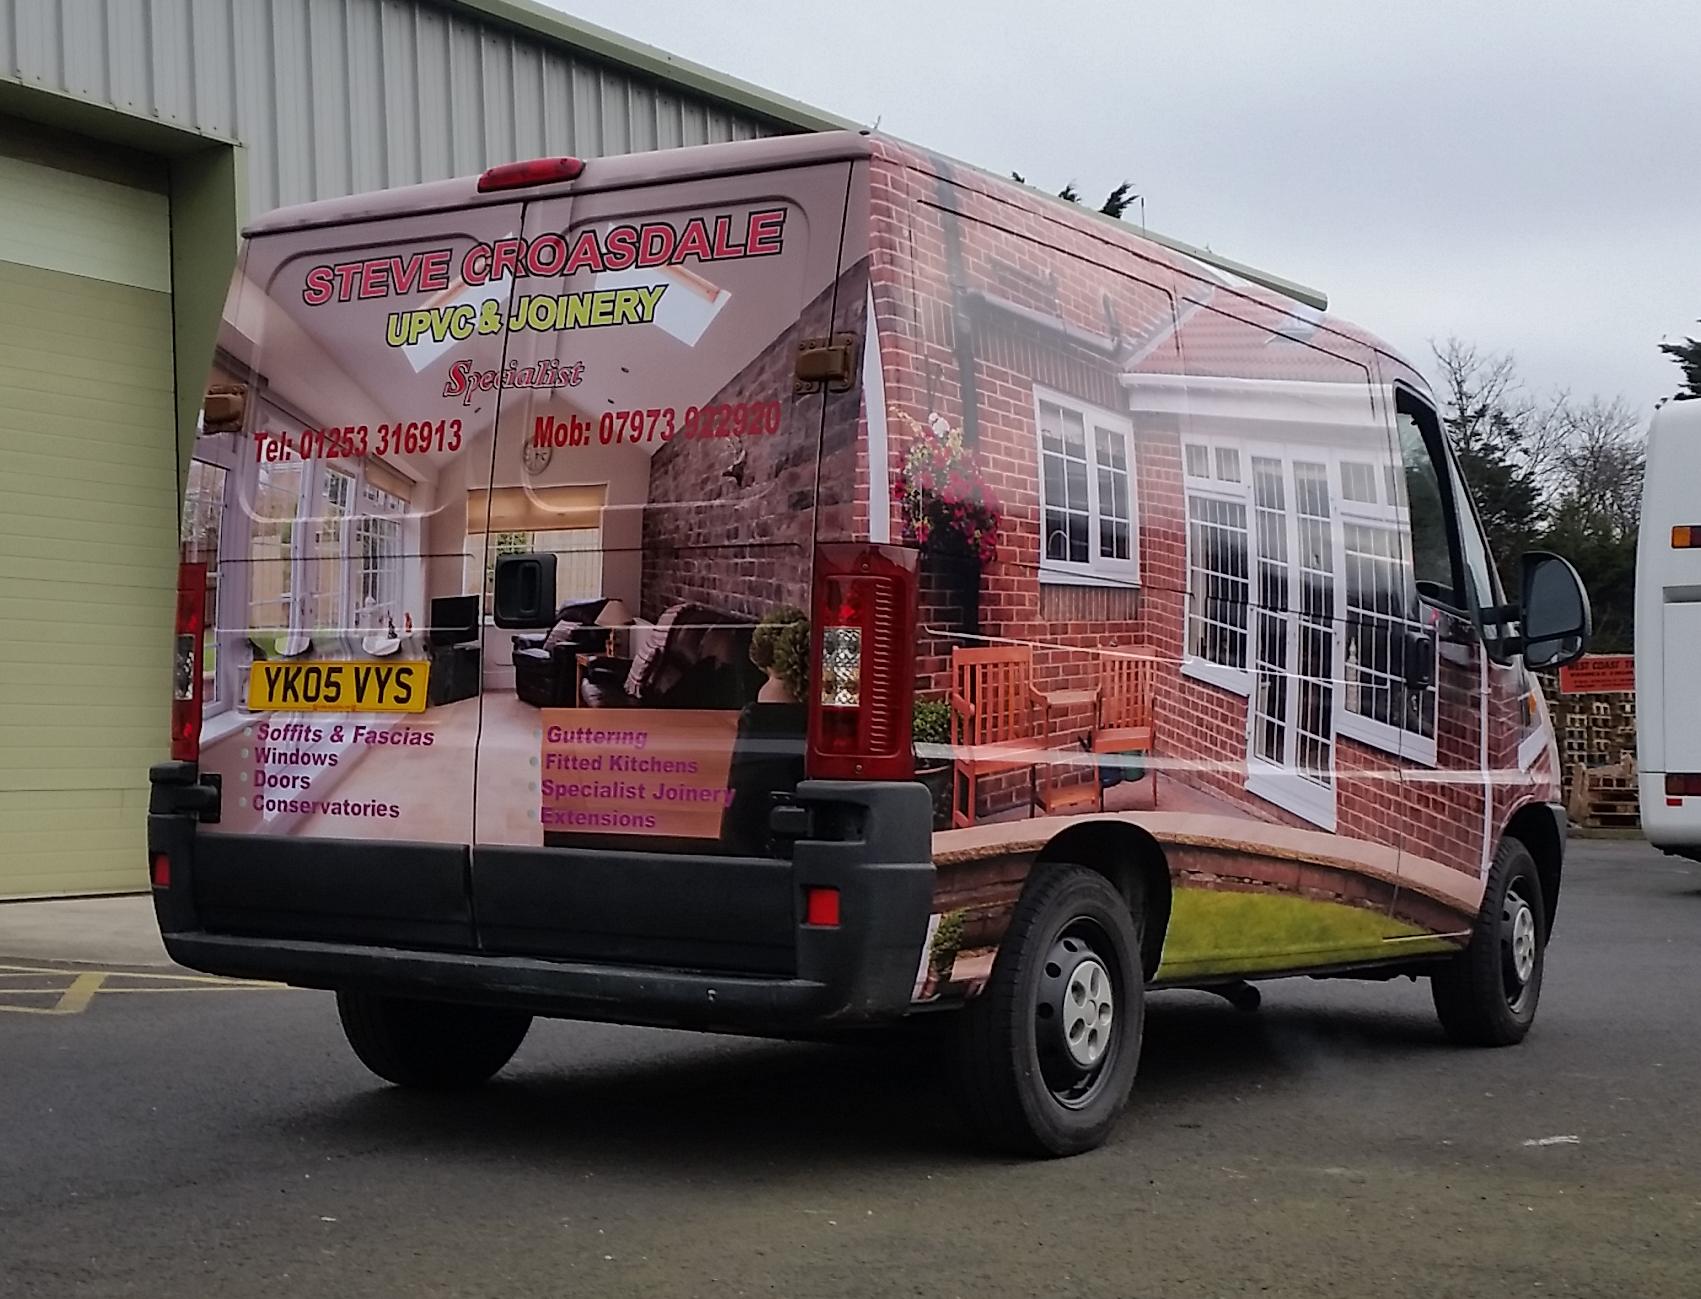 Full colour vehicle wrap on work van